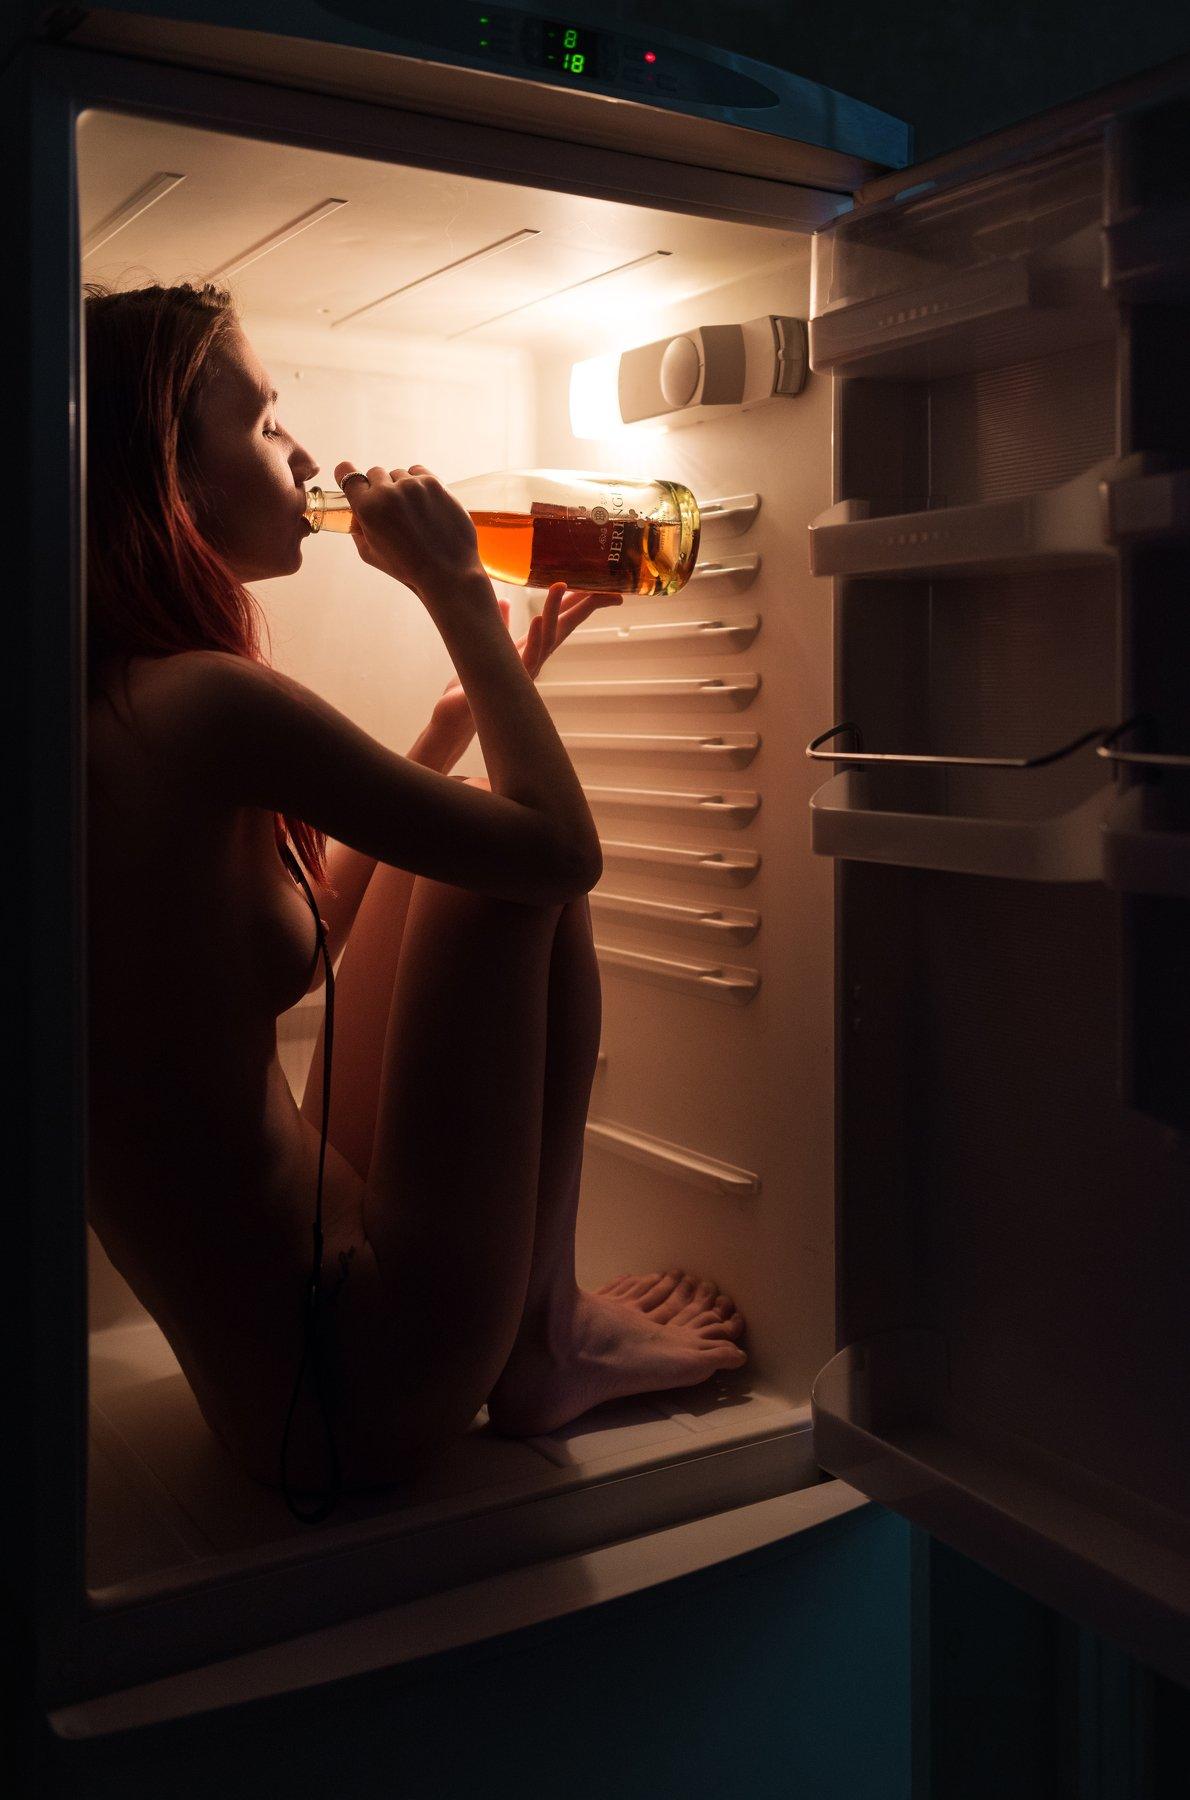 girl, drink, alcohol, fridge, vine, nude, slave, naked, nu, saint-petersburg, Роман Филиппов